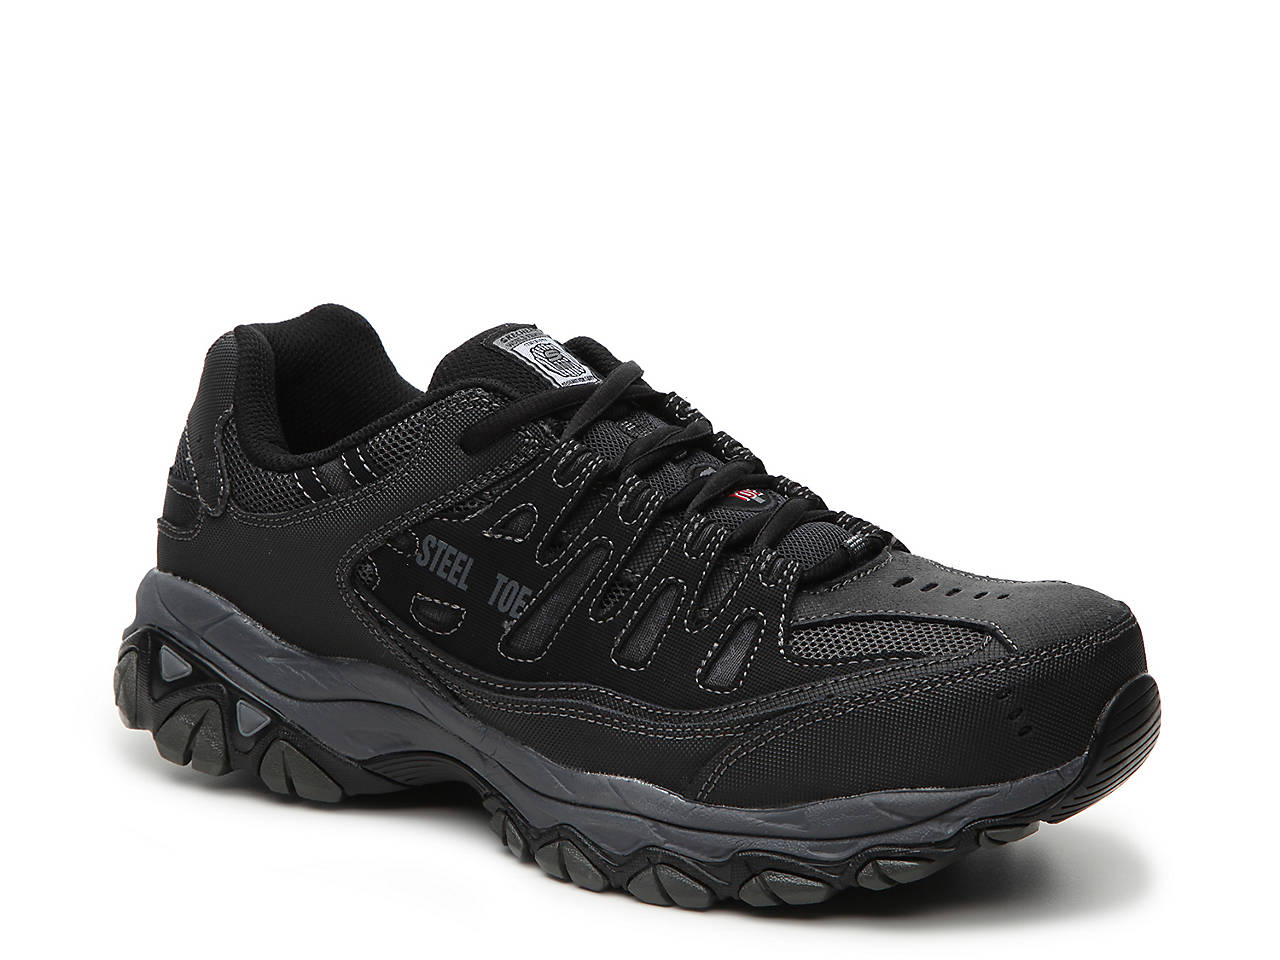 Skechers Work Relaxed Fit Cankton Steel Toe Sneaker Men s Shoes  de530a090ae7